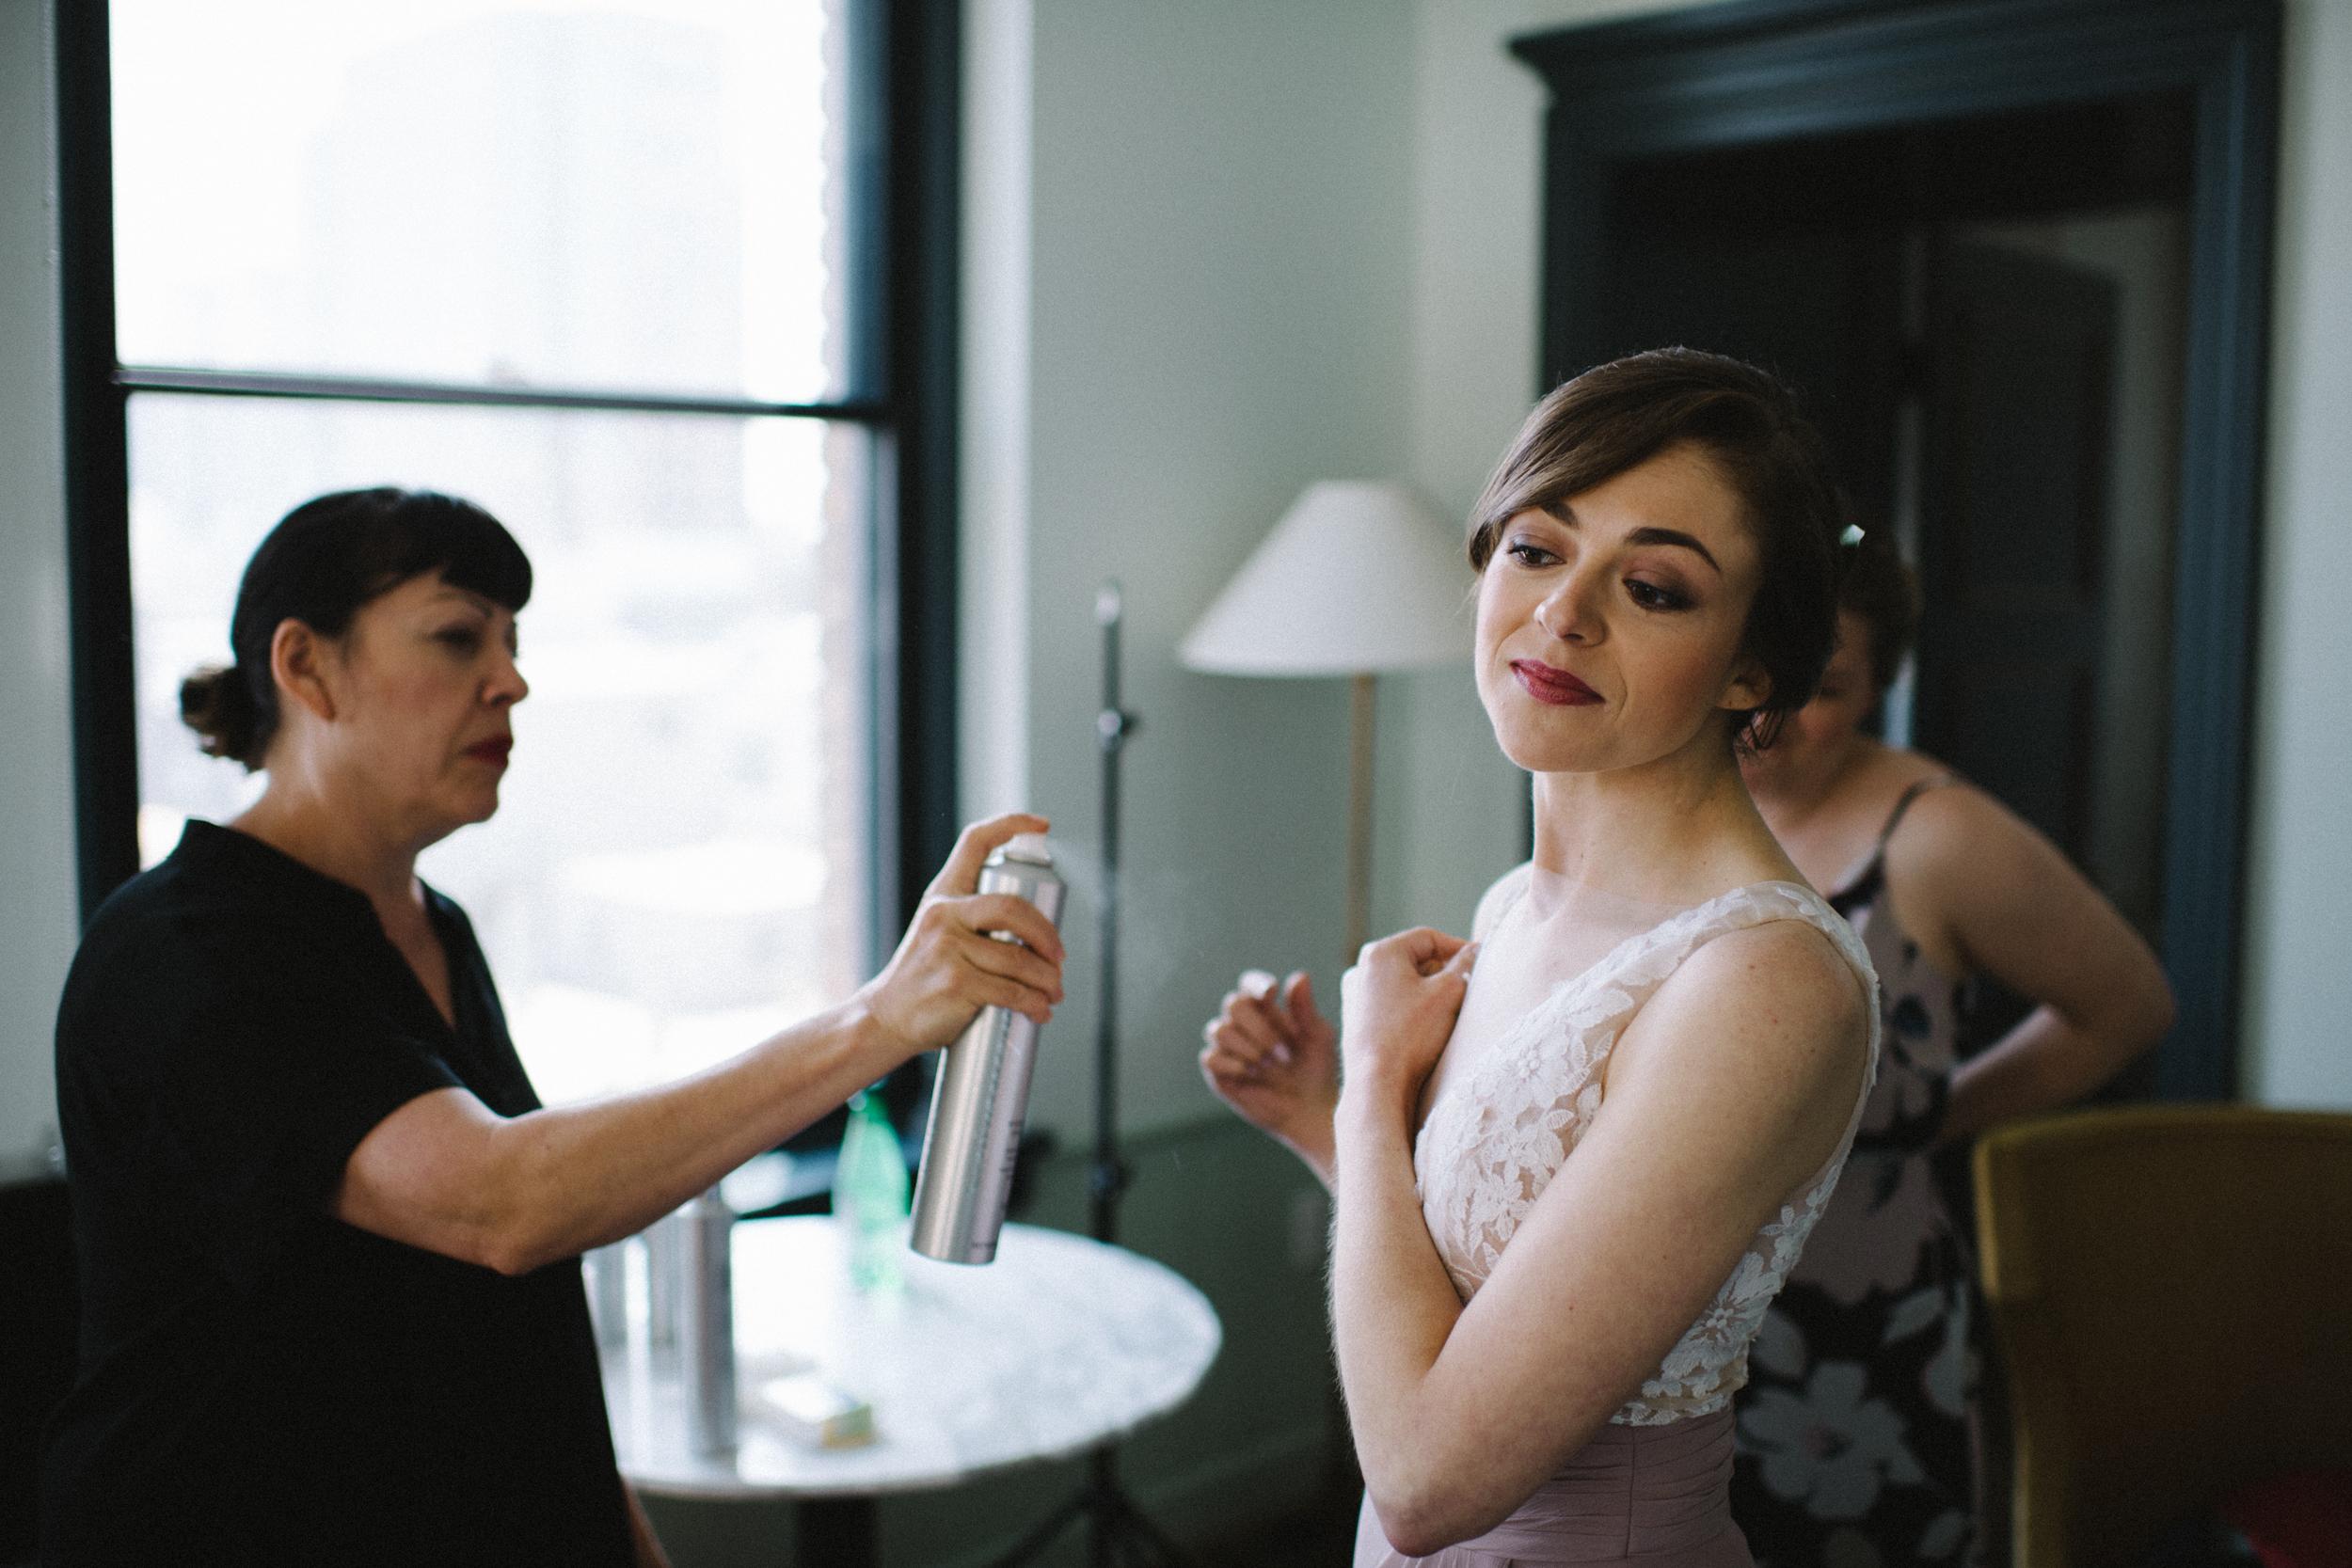 wedding_millwick_los_angeles-7.jpg